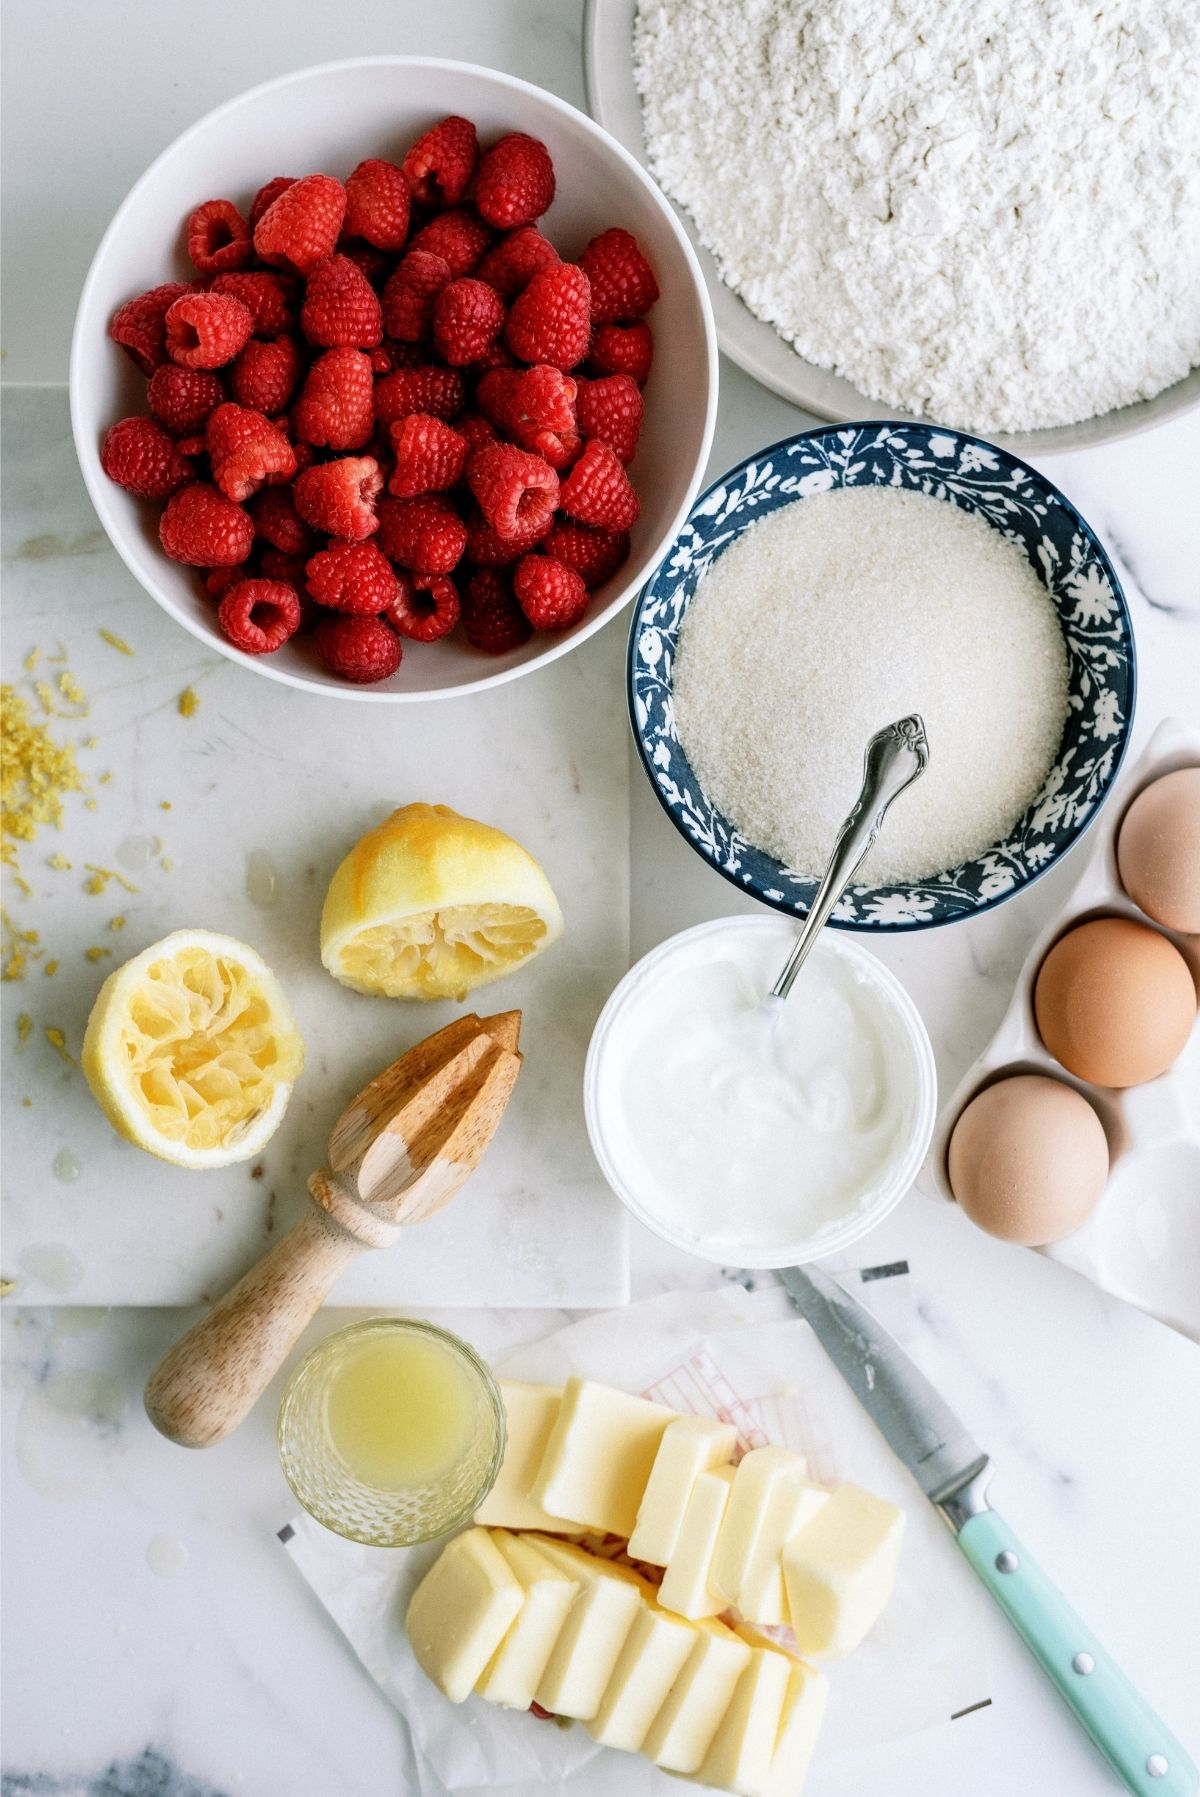 Ingredients for Fresh Raspberry Yogurt Bundt Cake